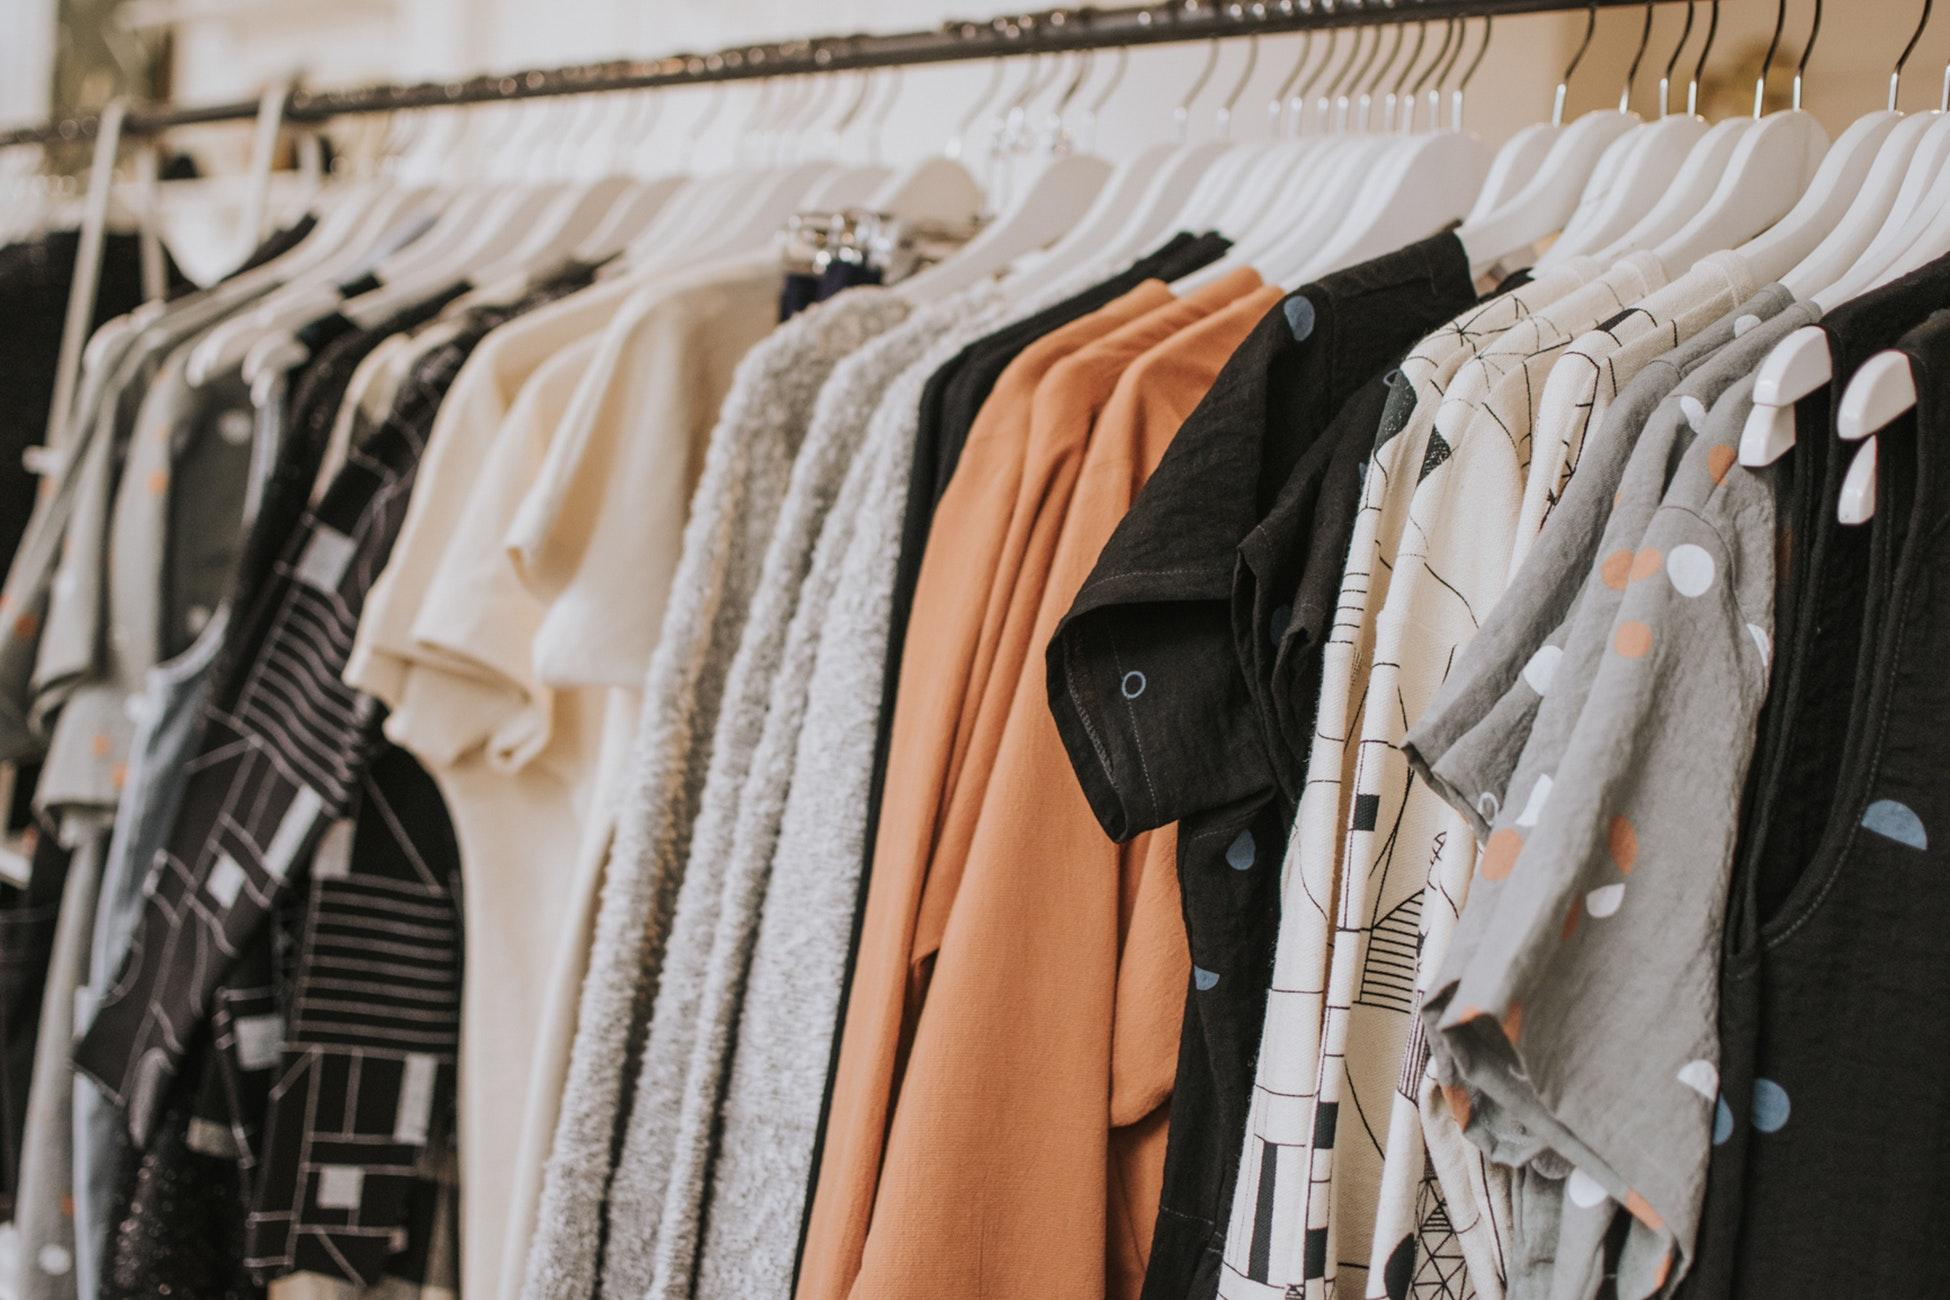 Step Into The Wardrobe Of Future At Munich Fabric Start Interlaced Textiles Smart Wearable Technology Fashiontech Knitting